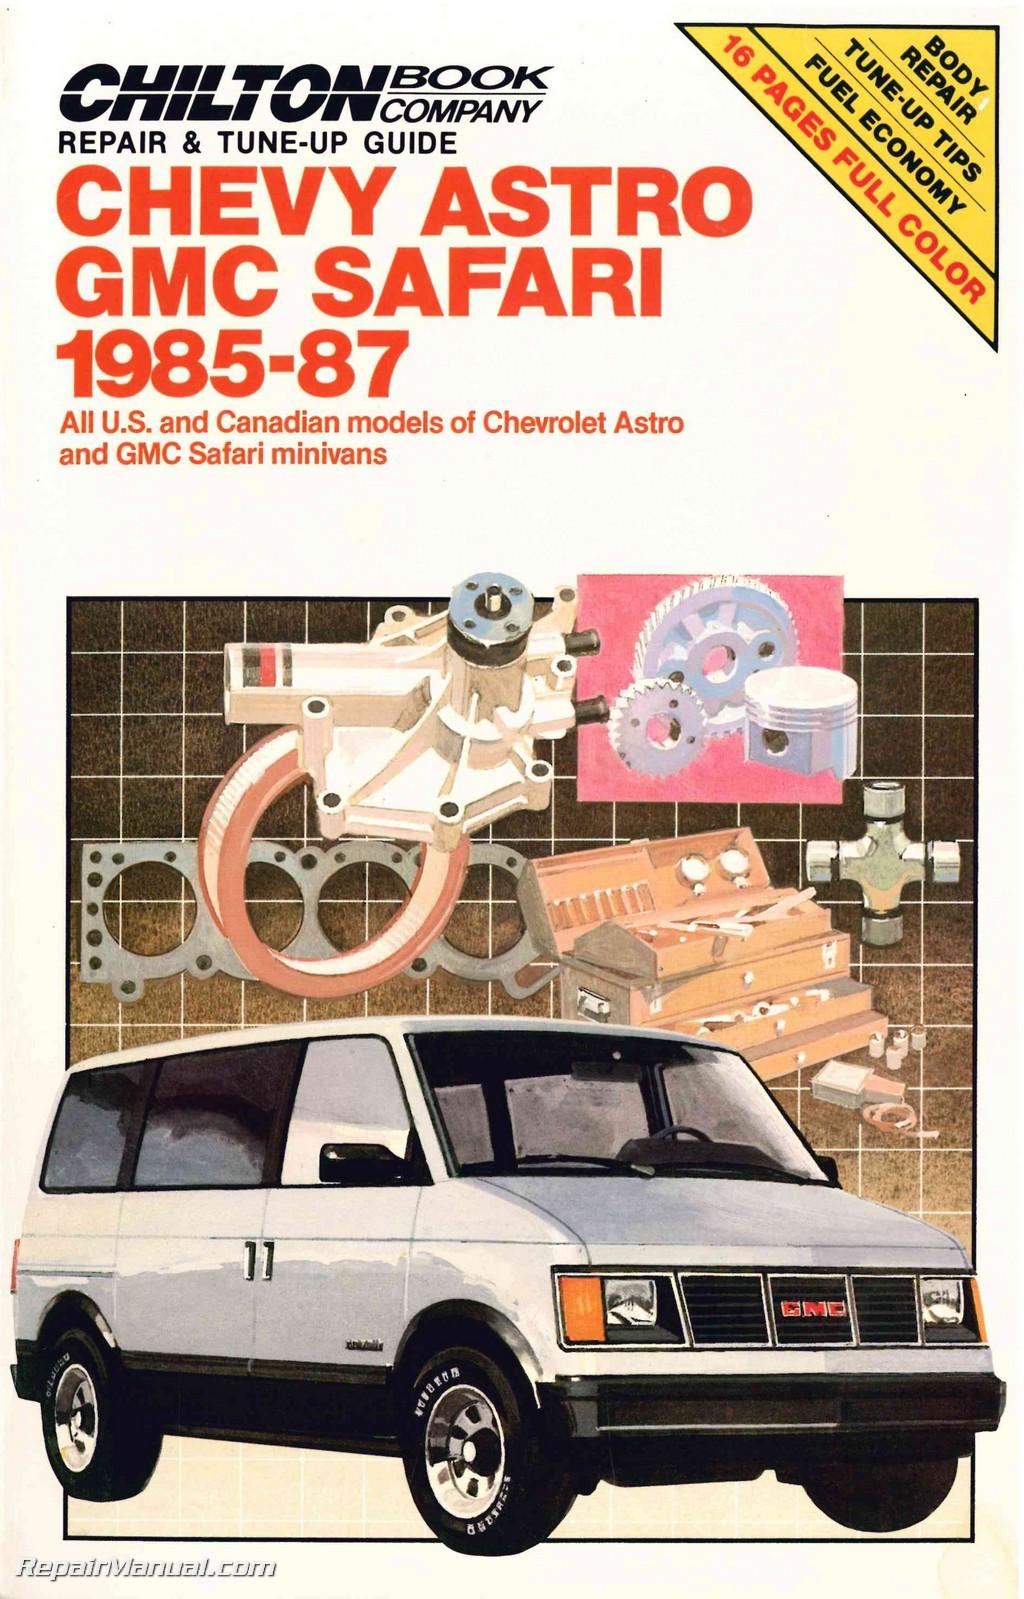 1994 chevy astro van gmc safari repair shop manual original set Array -  used chilton chevrolet astro gmc safari 1985 1987 repair manual rh  repairmanual ...